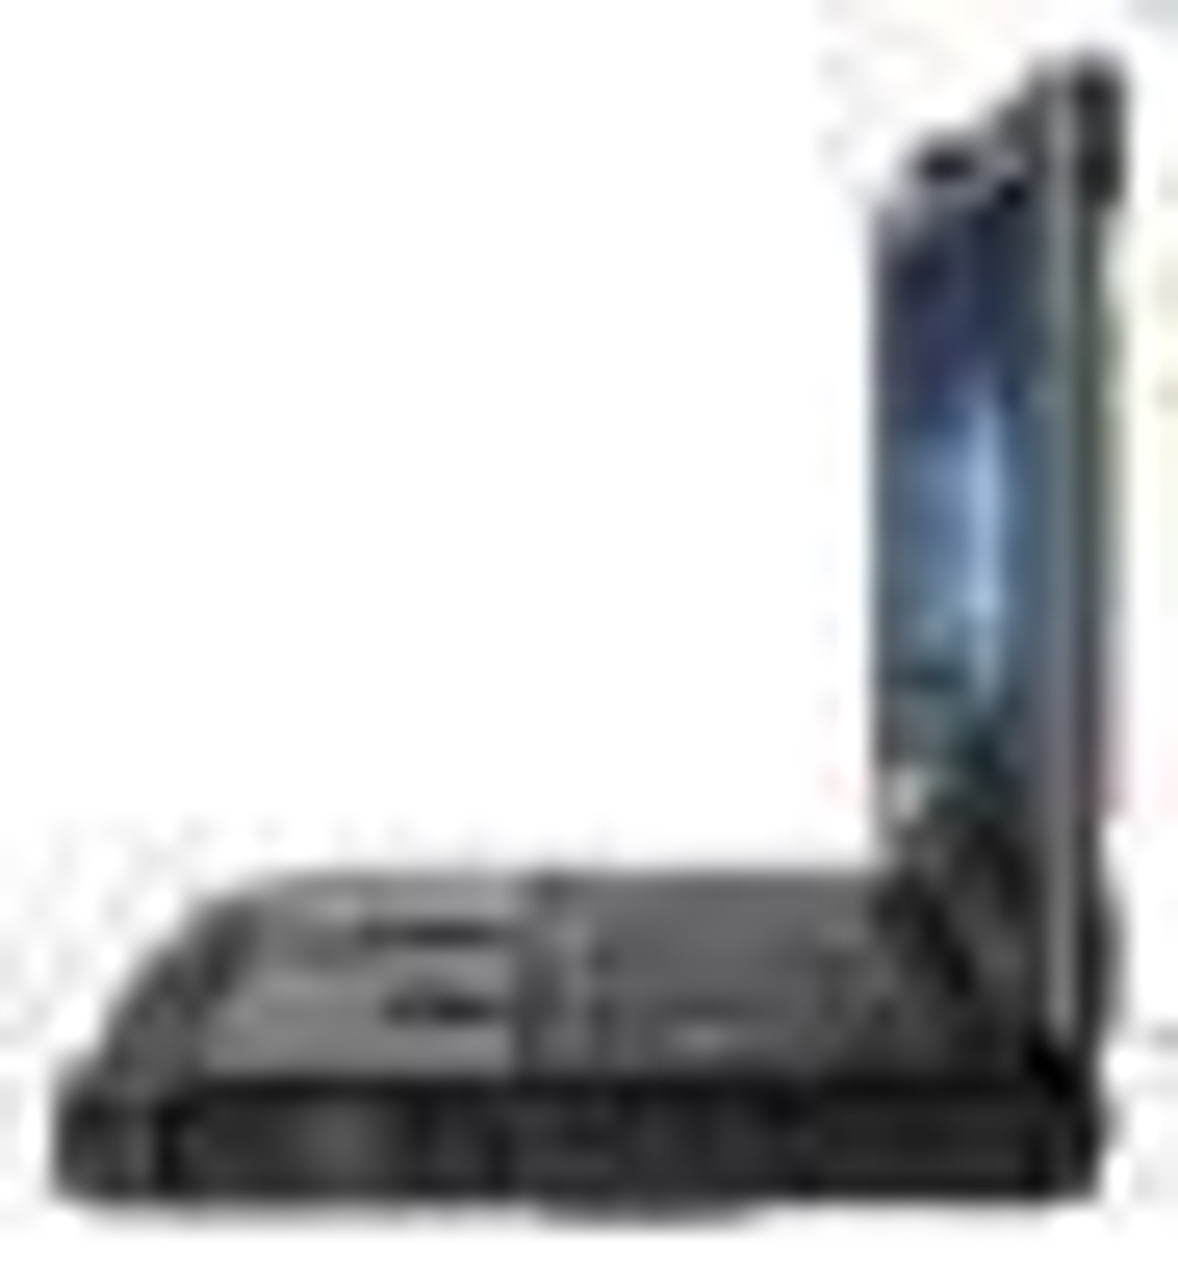 "Getac B300 G7 ,Intel Core i7-8550U Processor 1.8GHz,13.3"" W/ DVD Multi+Smart Card Reader, Win10 Pro x64 w/ 16GB RAM,256GB SSD,Sunlight Readable (LCD+Touch),Backlit KBD with Fingerprint,Wifi+BT+GPS+Passthrough,HDMI, Express Card 54, SD Card Reader, TP"